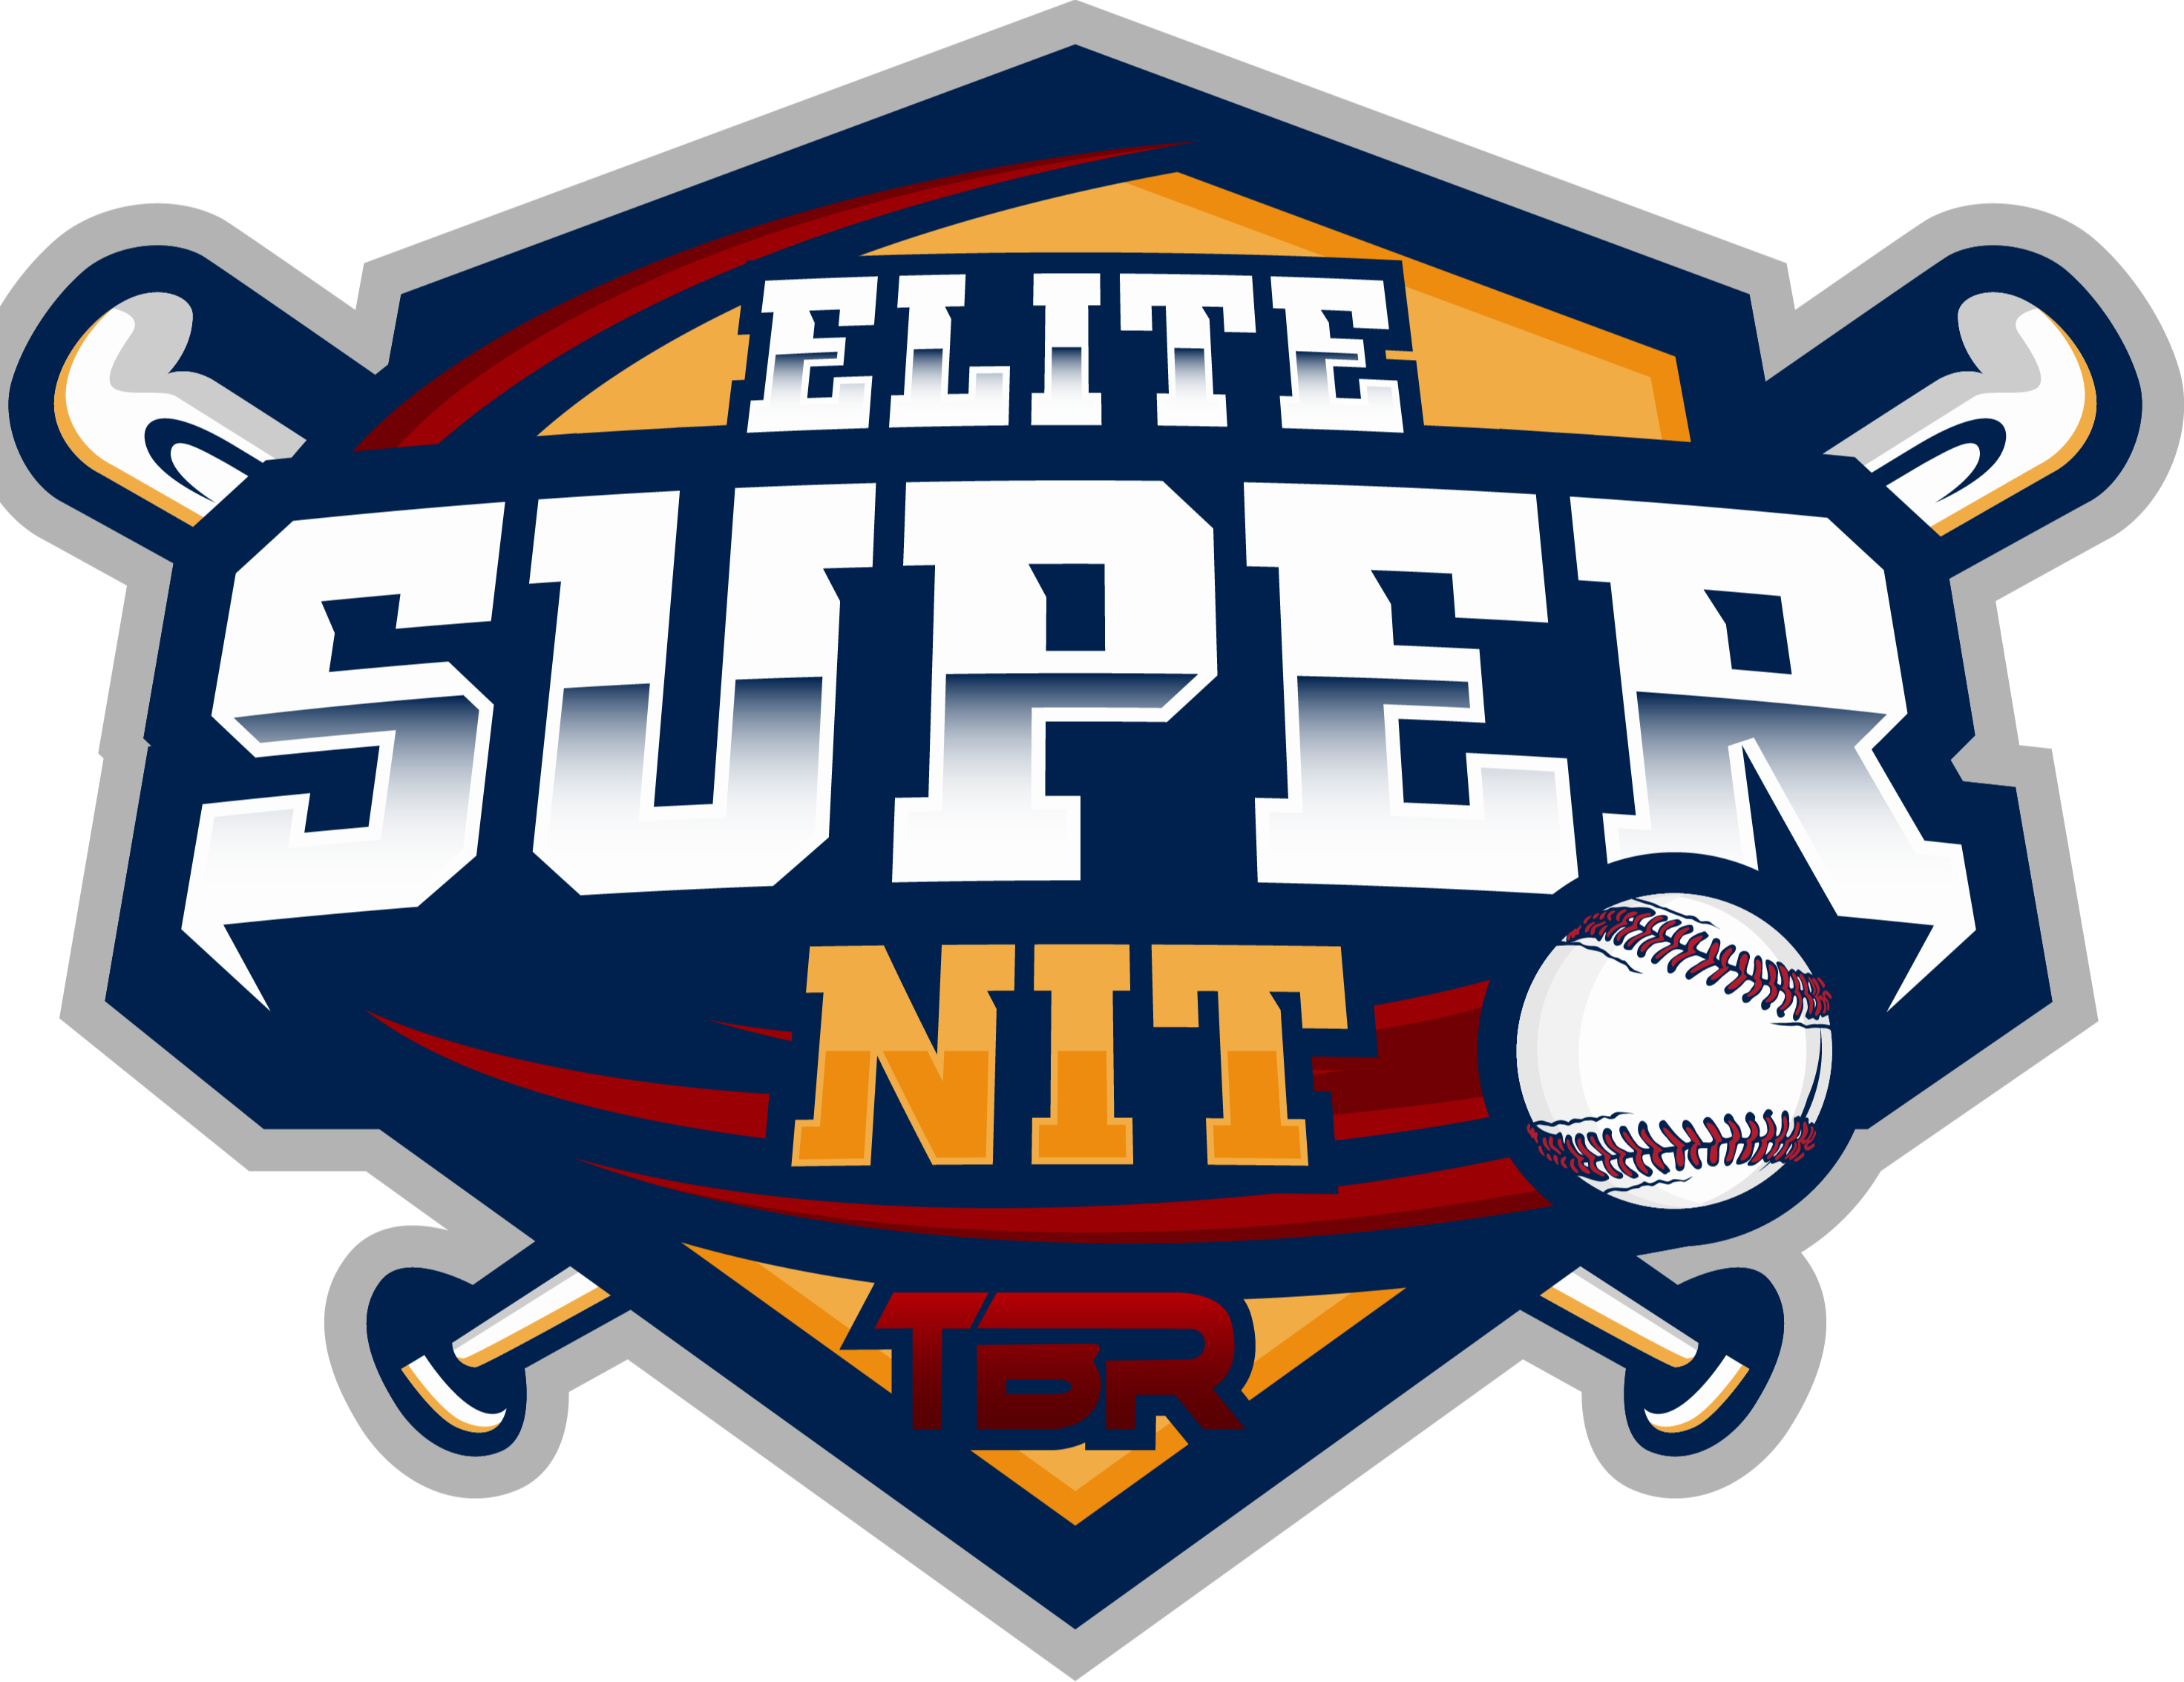 Midwest Elite Super NIT